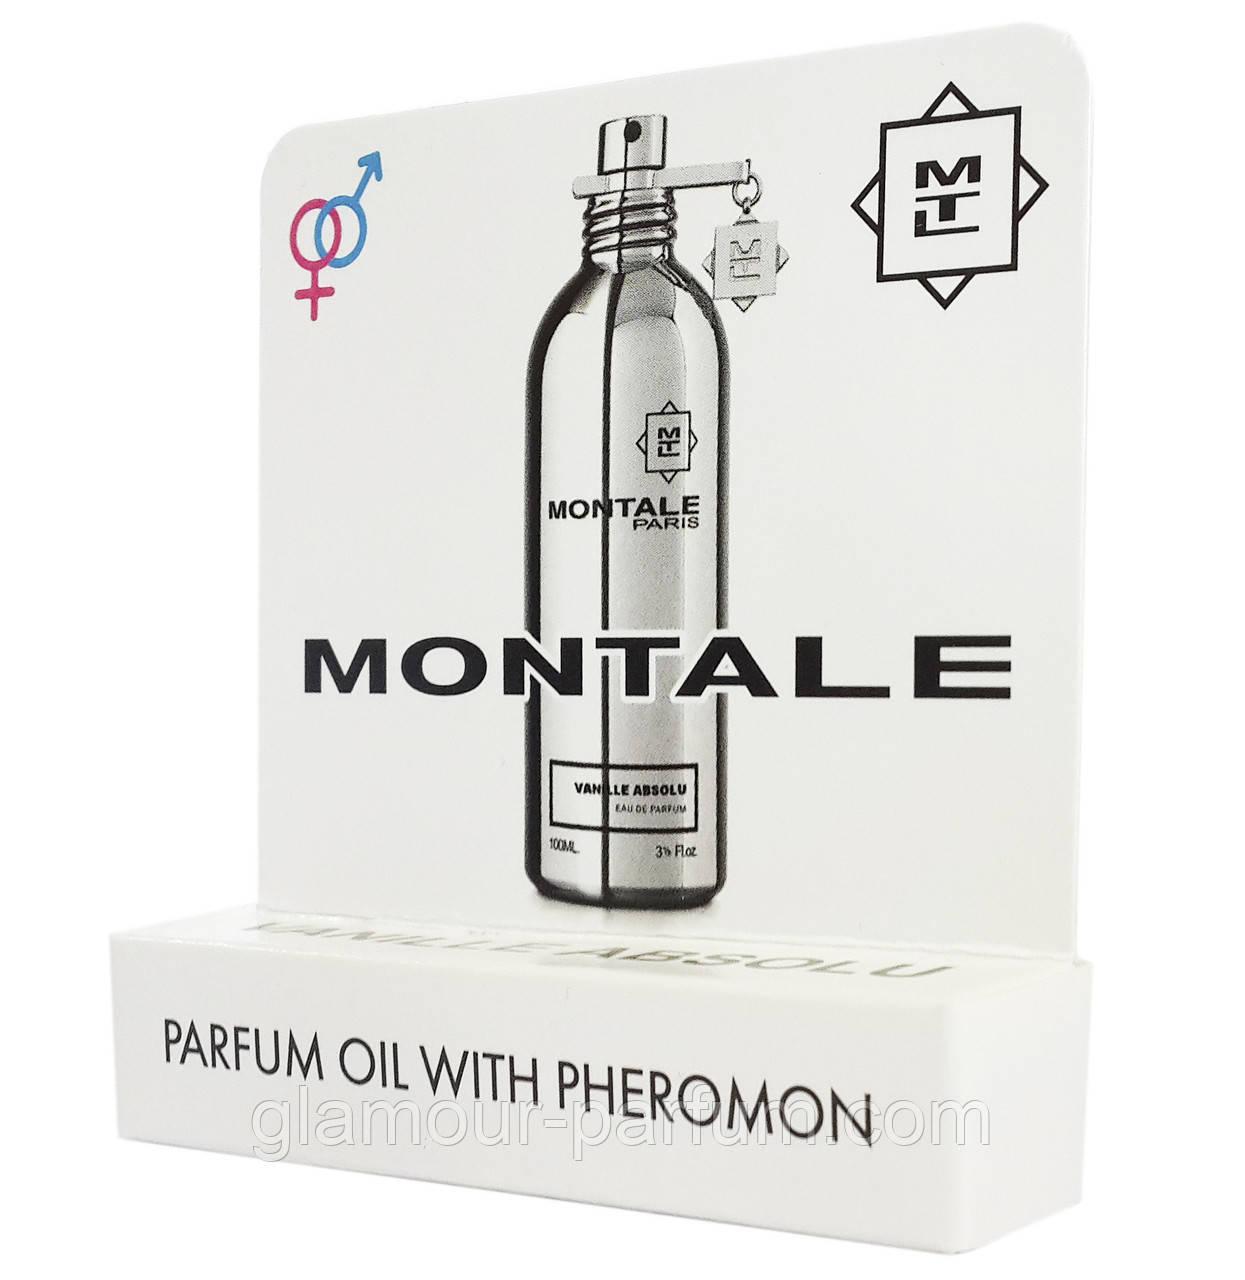 Мини парфюм с феромонами Montale Vanille Absolu ( Монталь Ванила Абсолю) 5 мл (реплика)